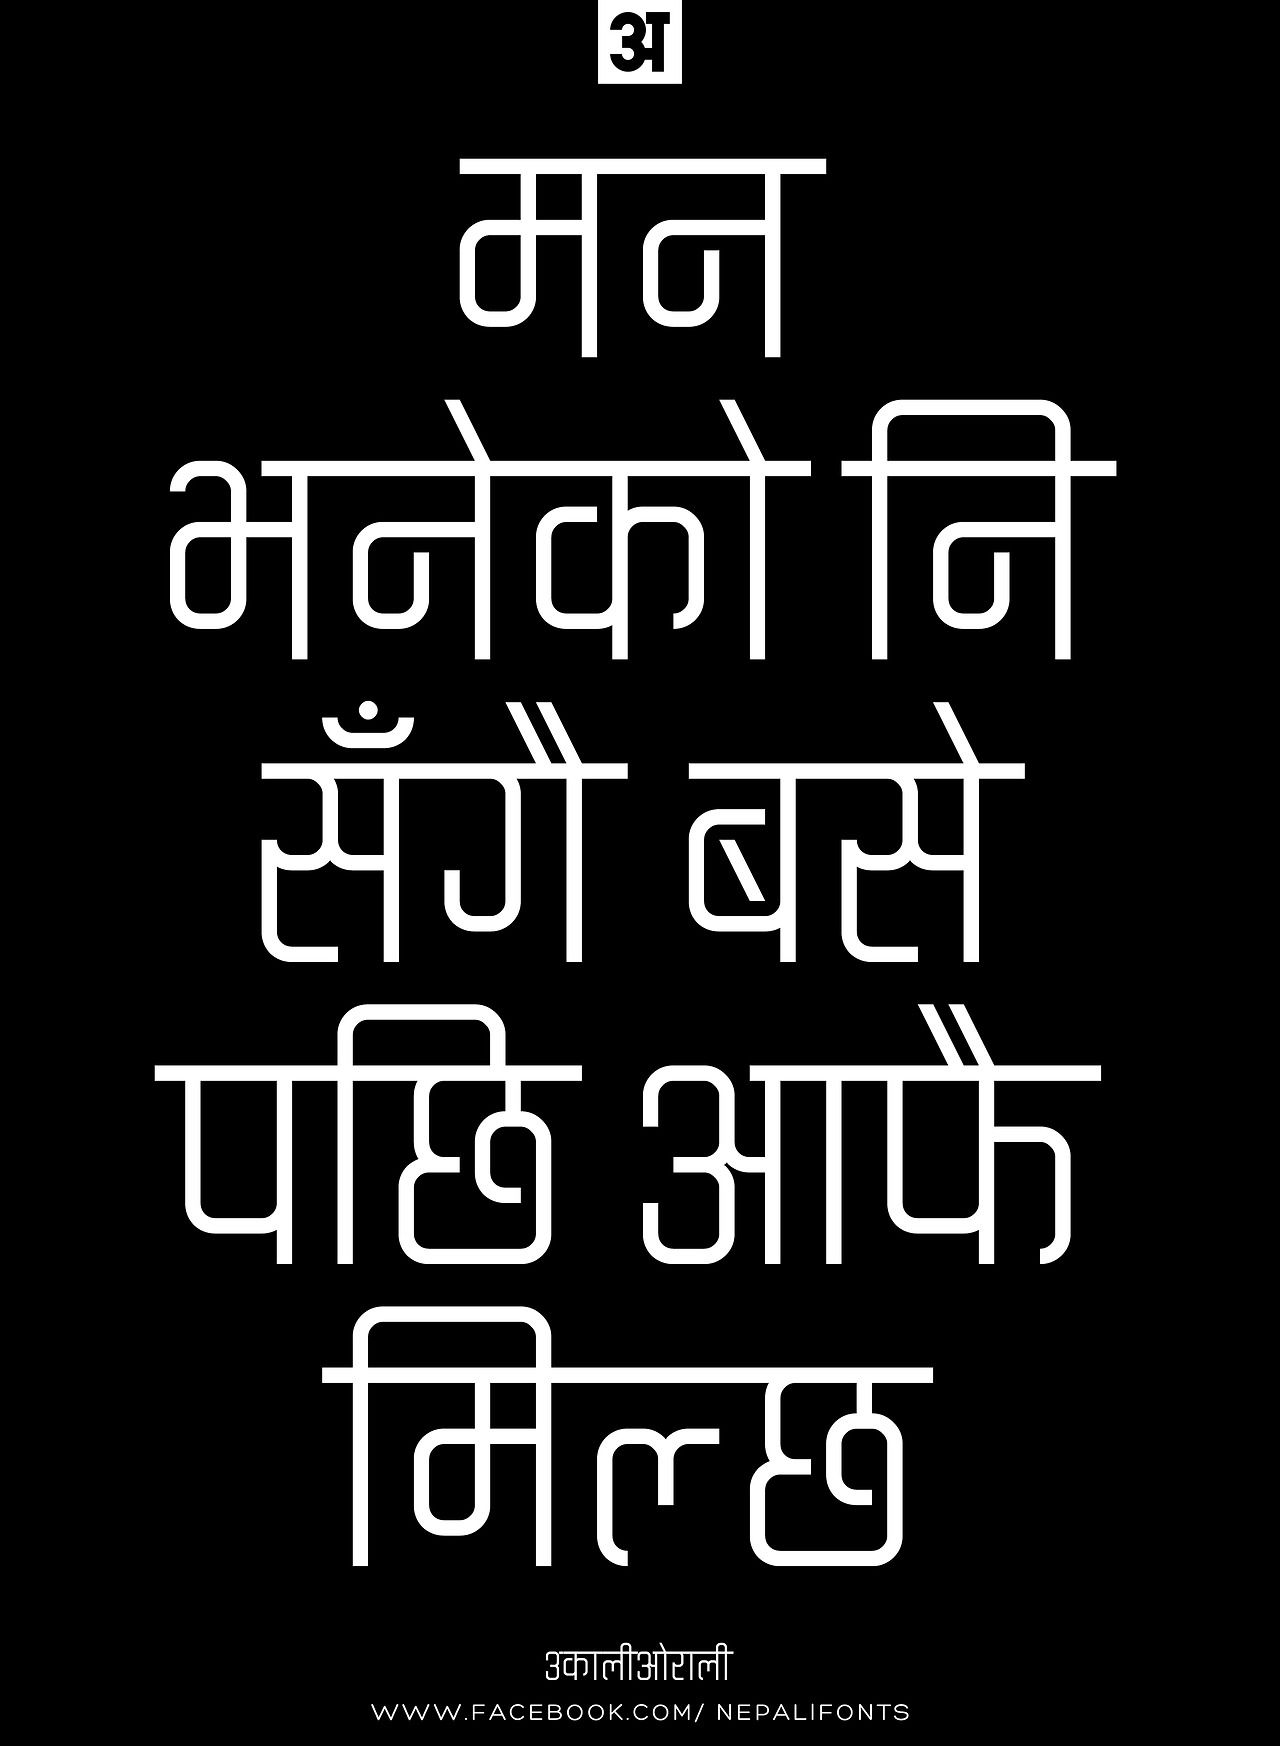 Nepali Quotes : nepali, quotes, Nepali, Quotes, Collection